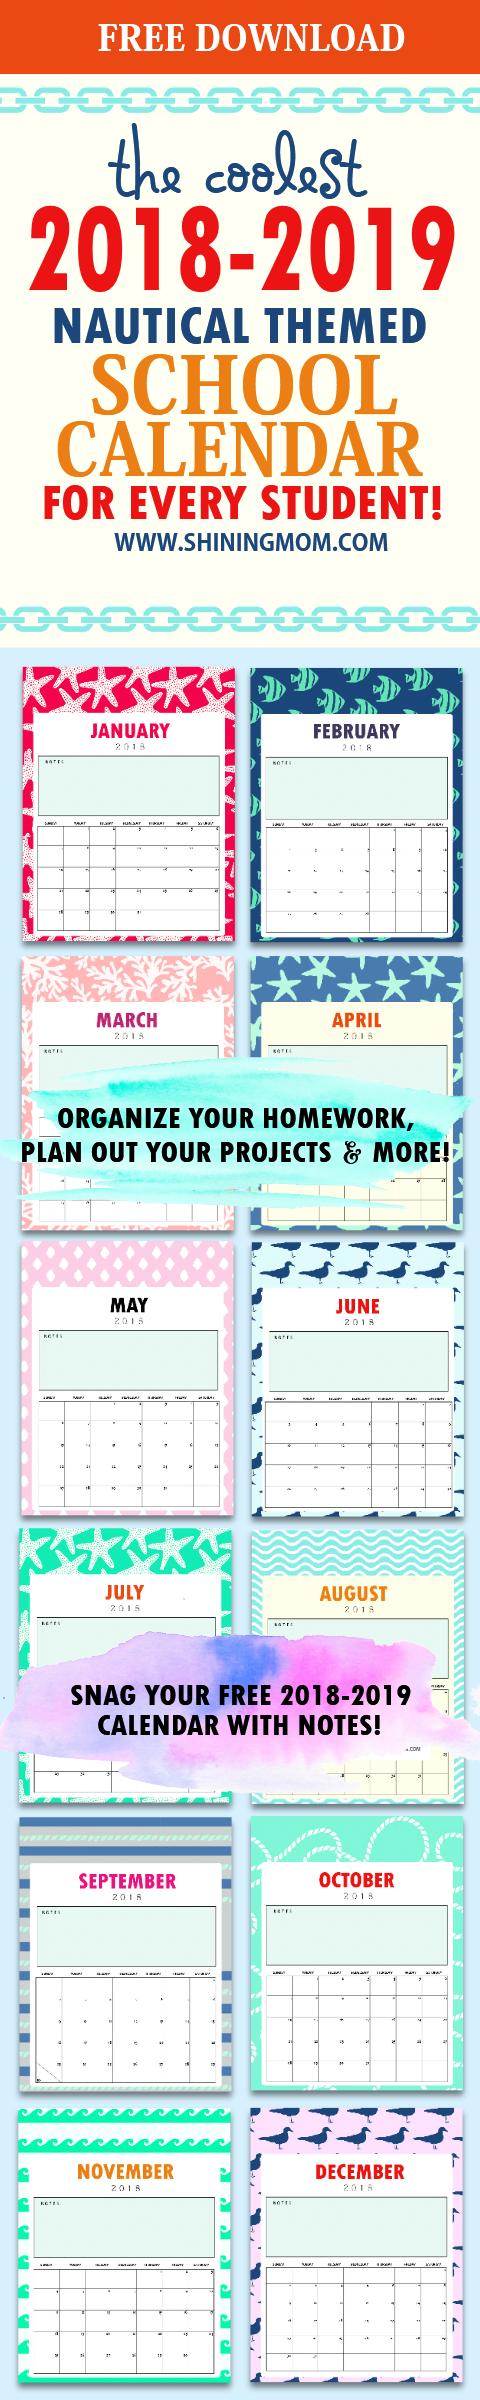 Free school calendar 2018 for kids